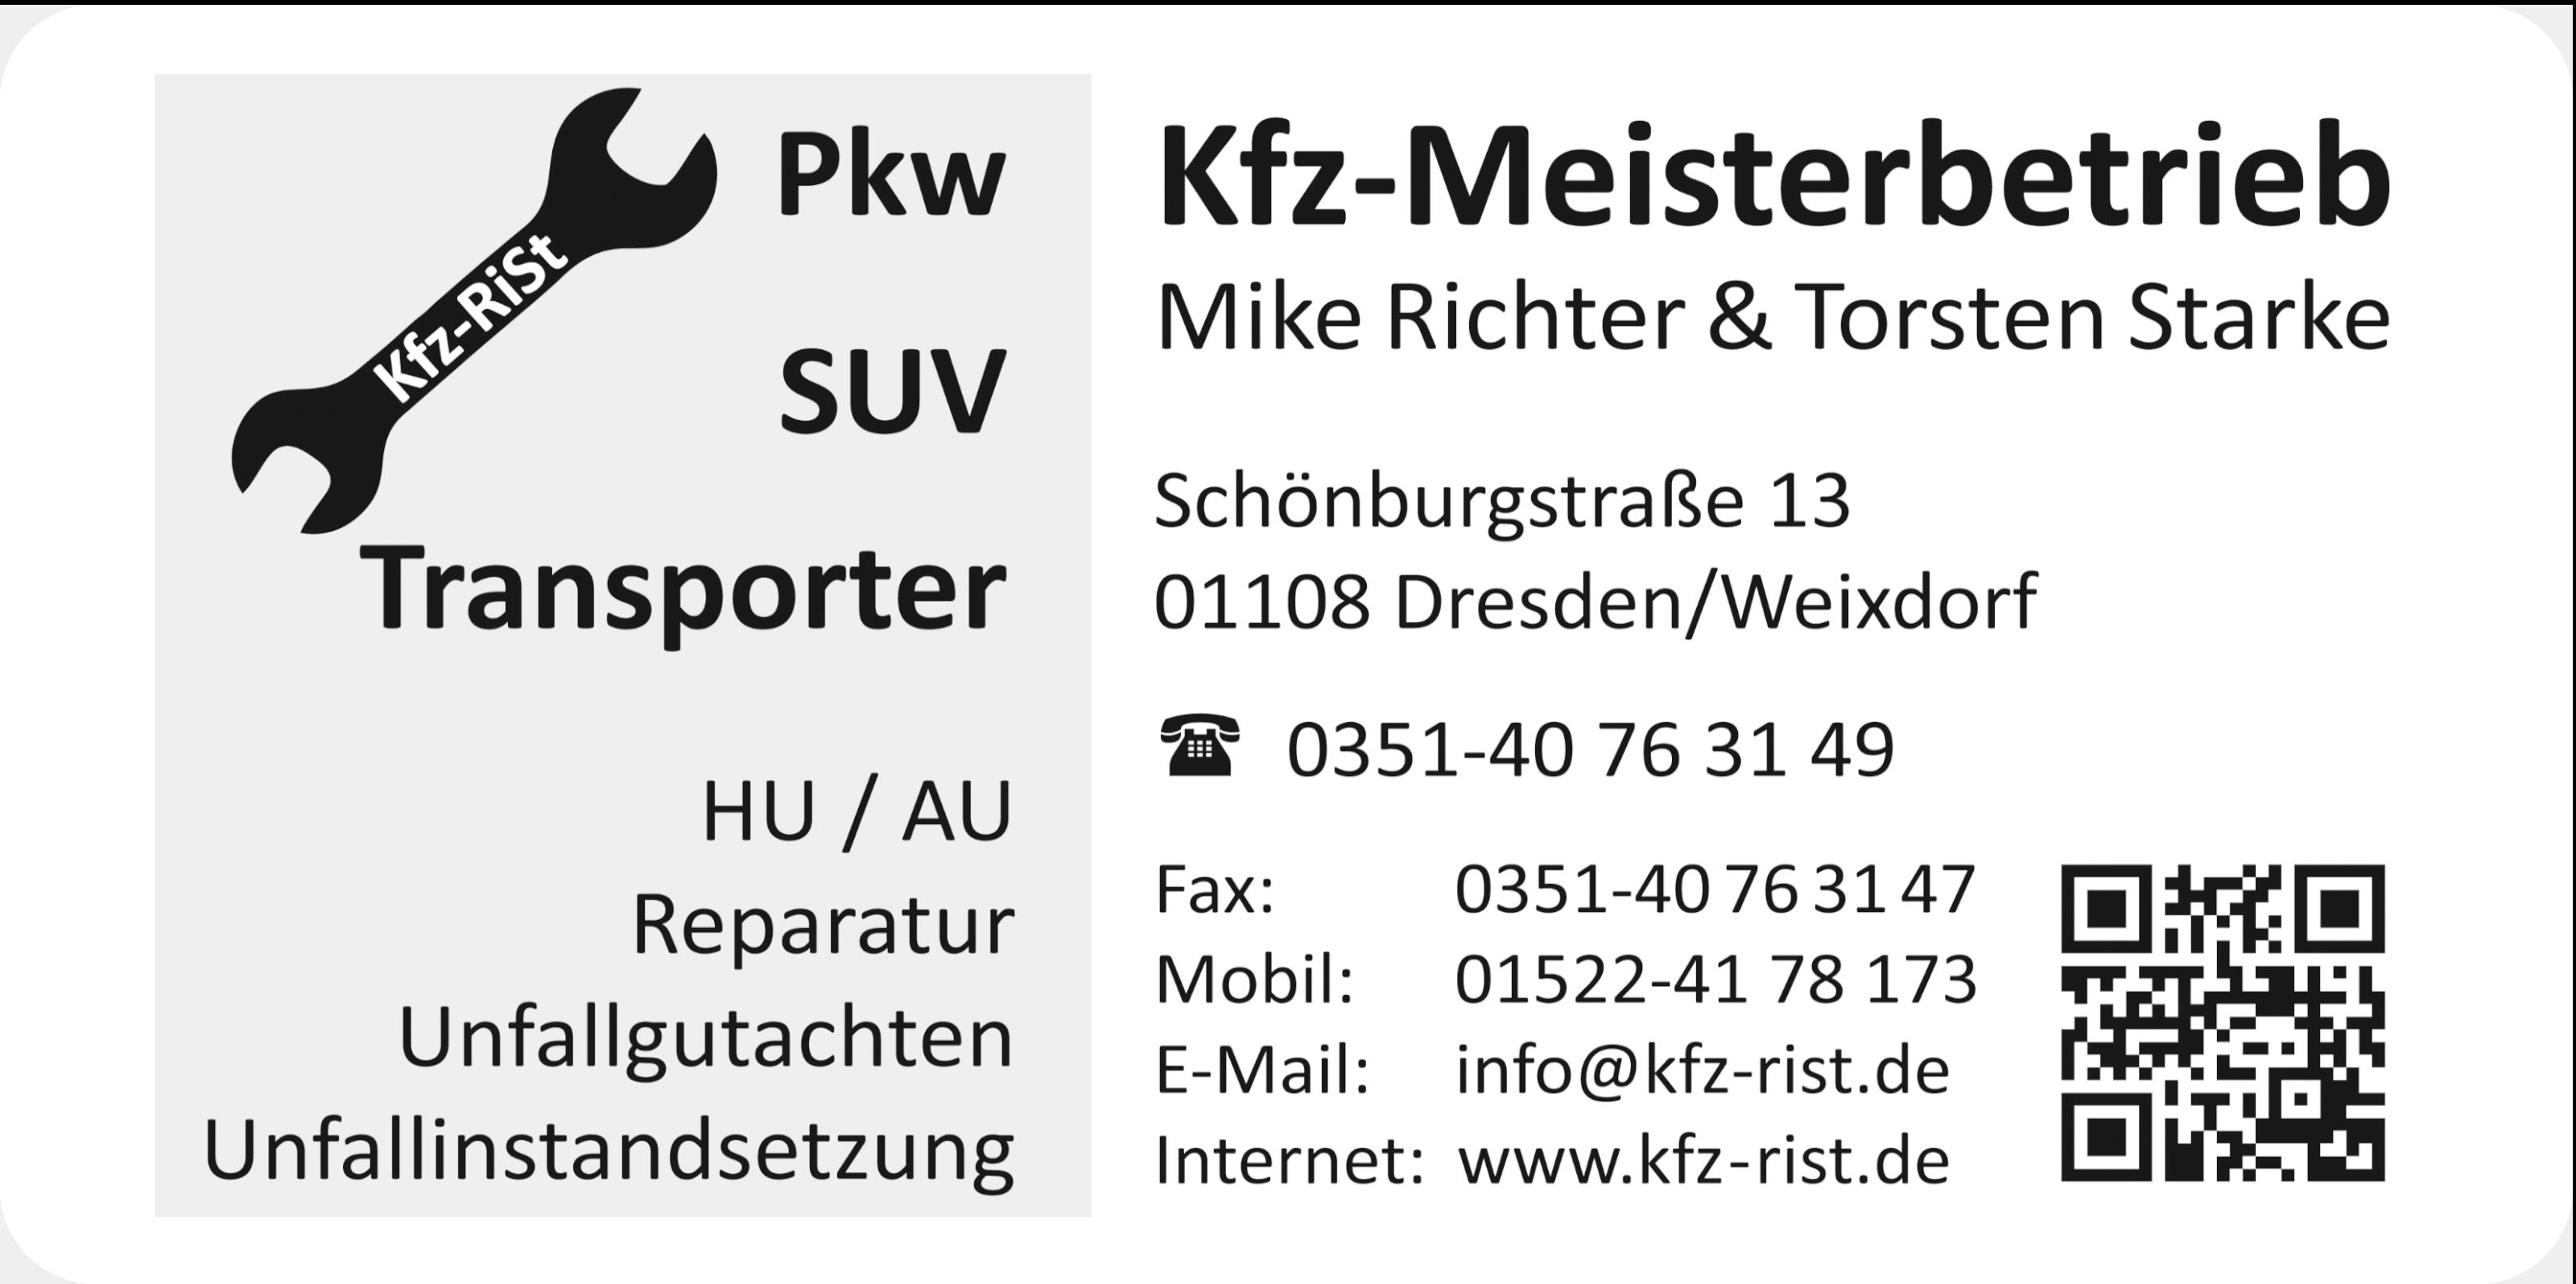 KFZ RiSt Weixdorf / DD